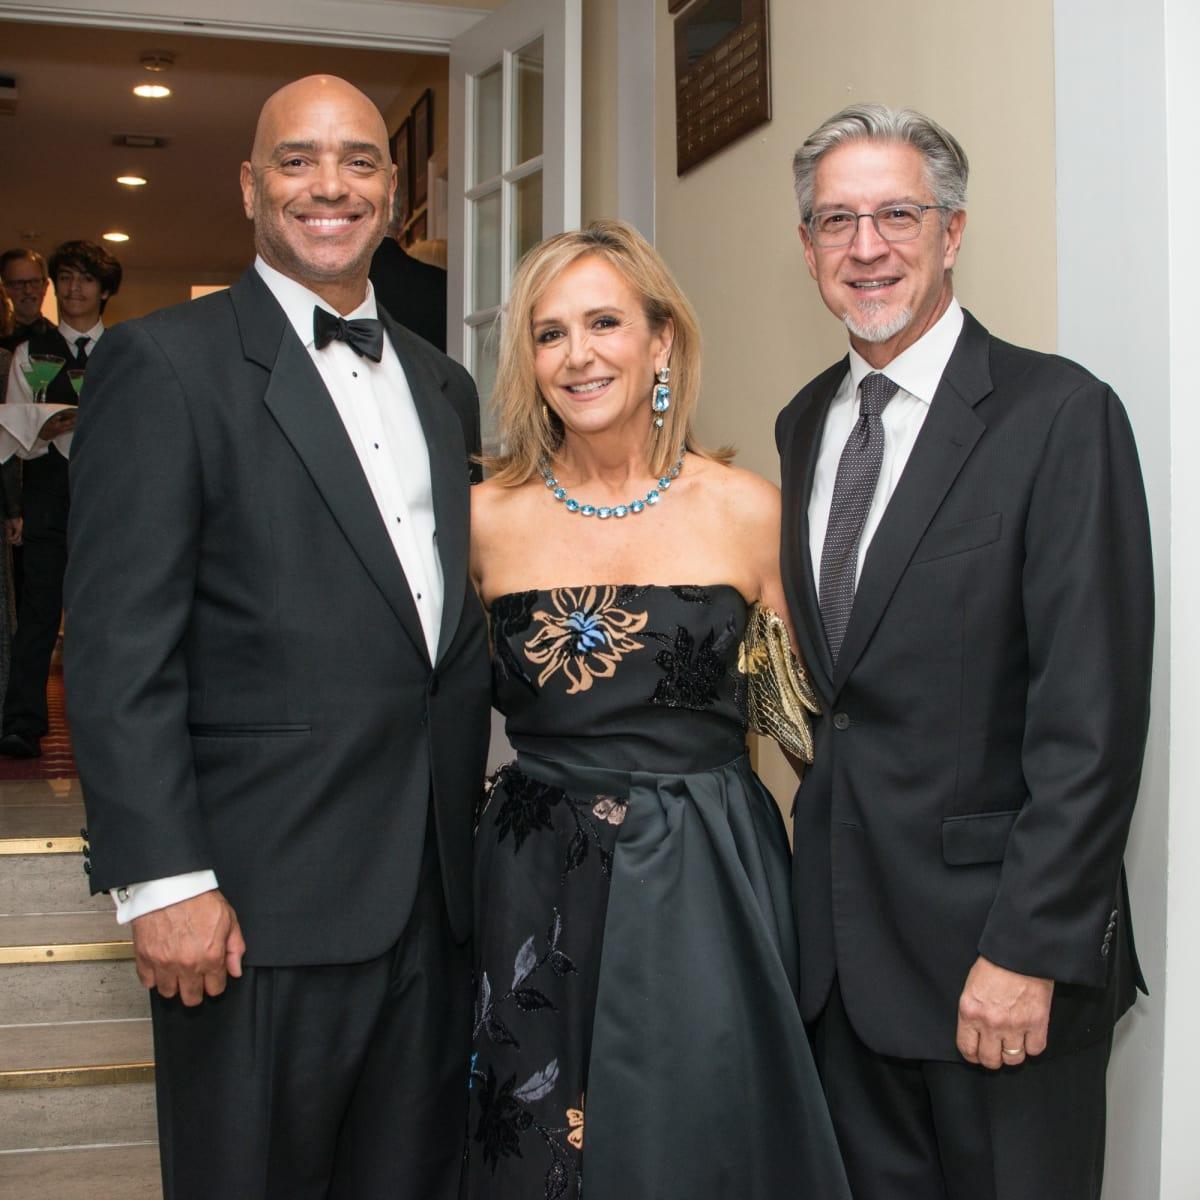 Charles Ellis, Jane McGarry, Michael Cain, Jade ball 2017